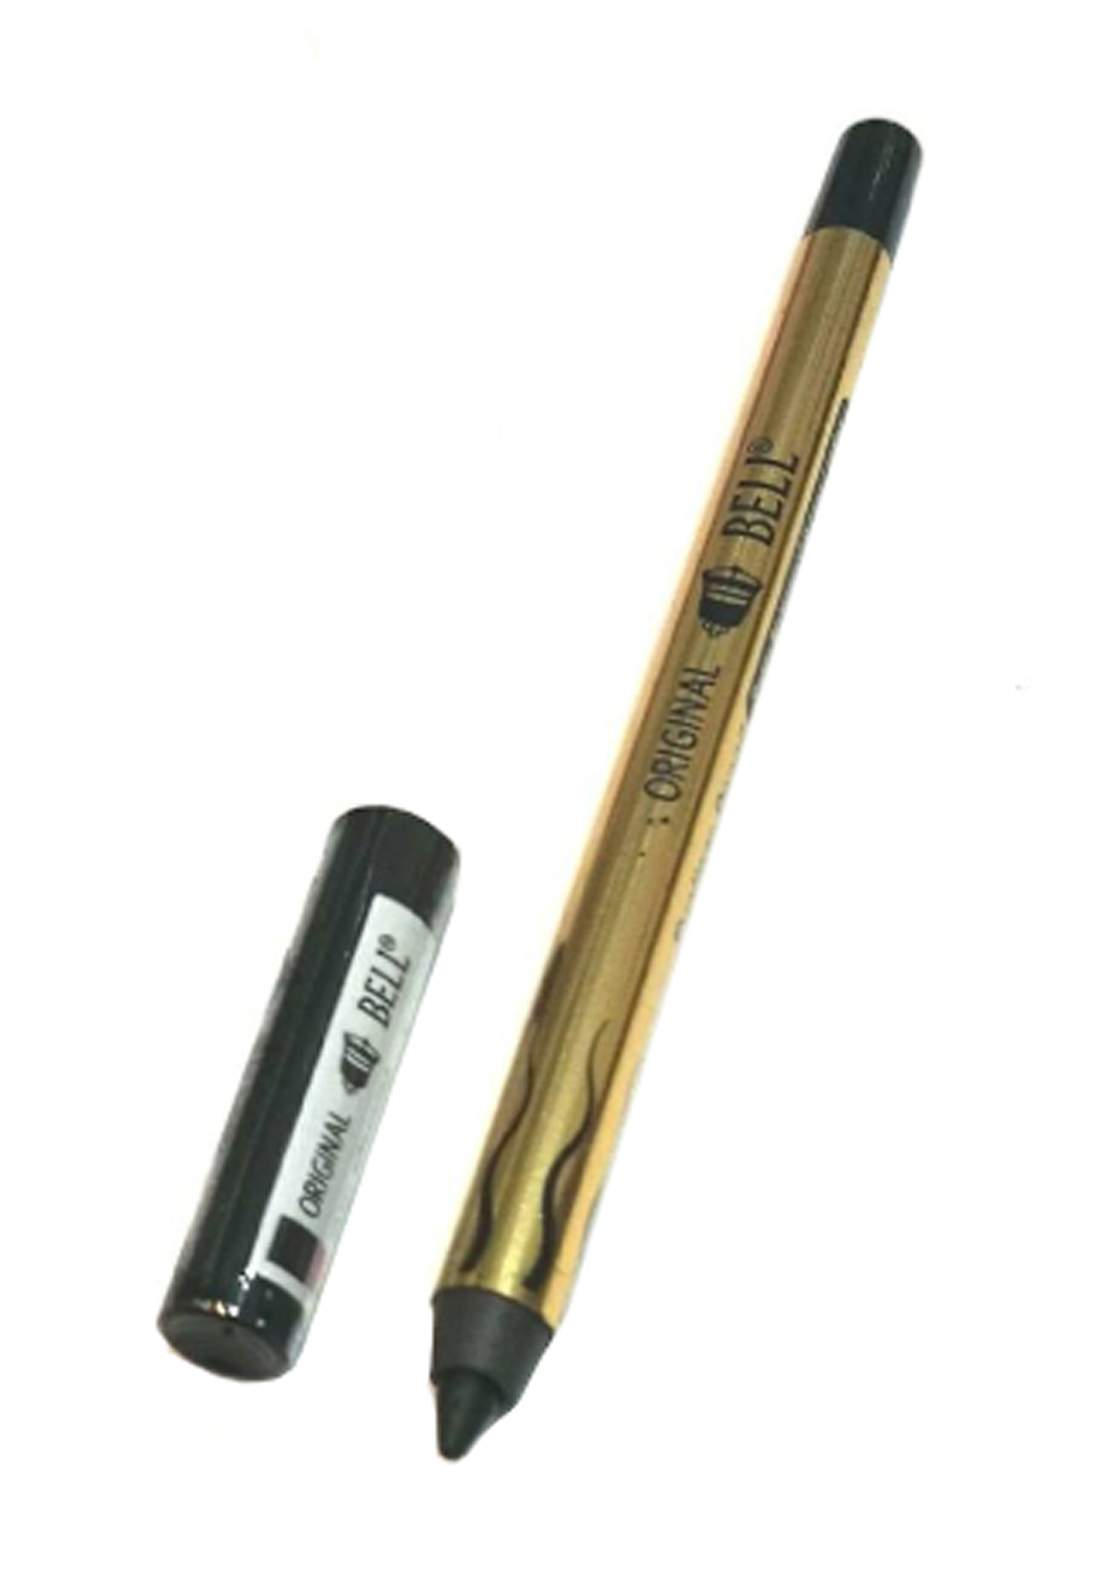 Bell Eyeliner Pencil Super Waterproof \ Sensitive Eye قلم تحديد العيون